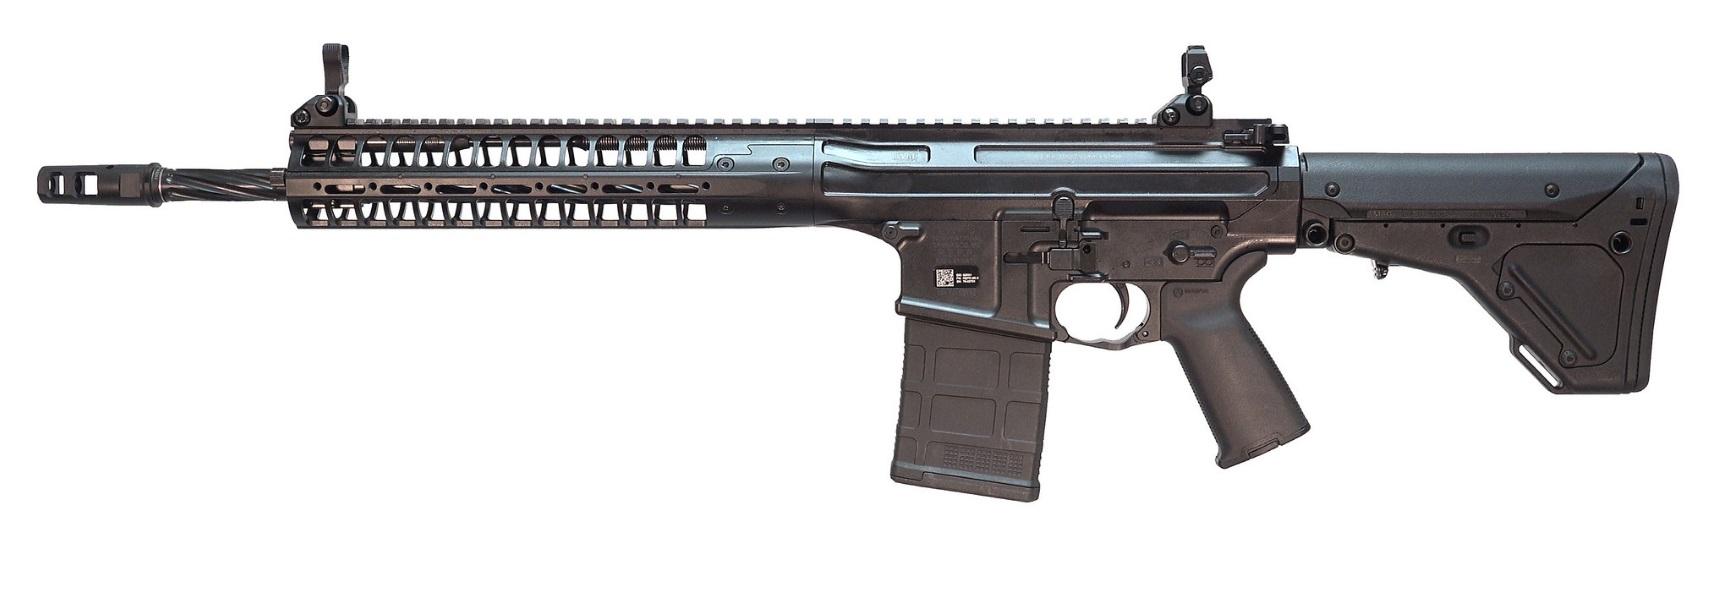 LWRC REPR MKII 7.62 x 51mm | 308 Win